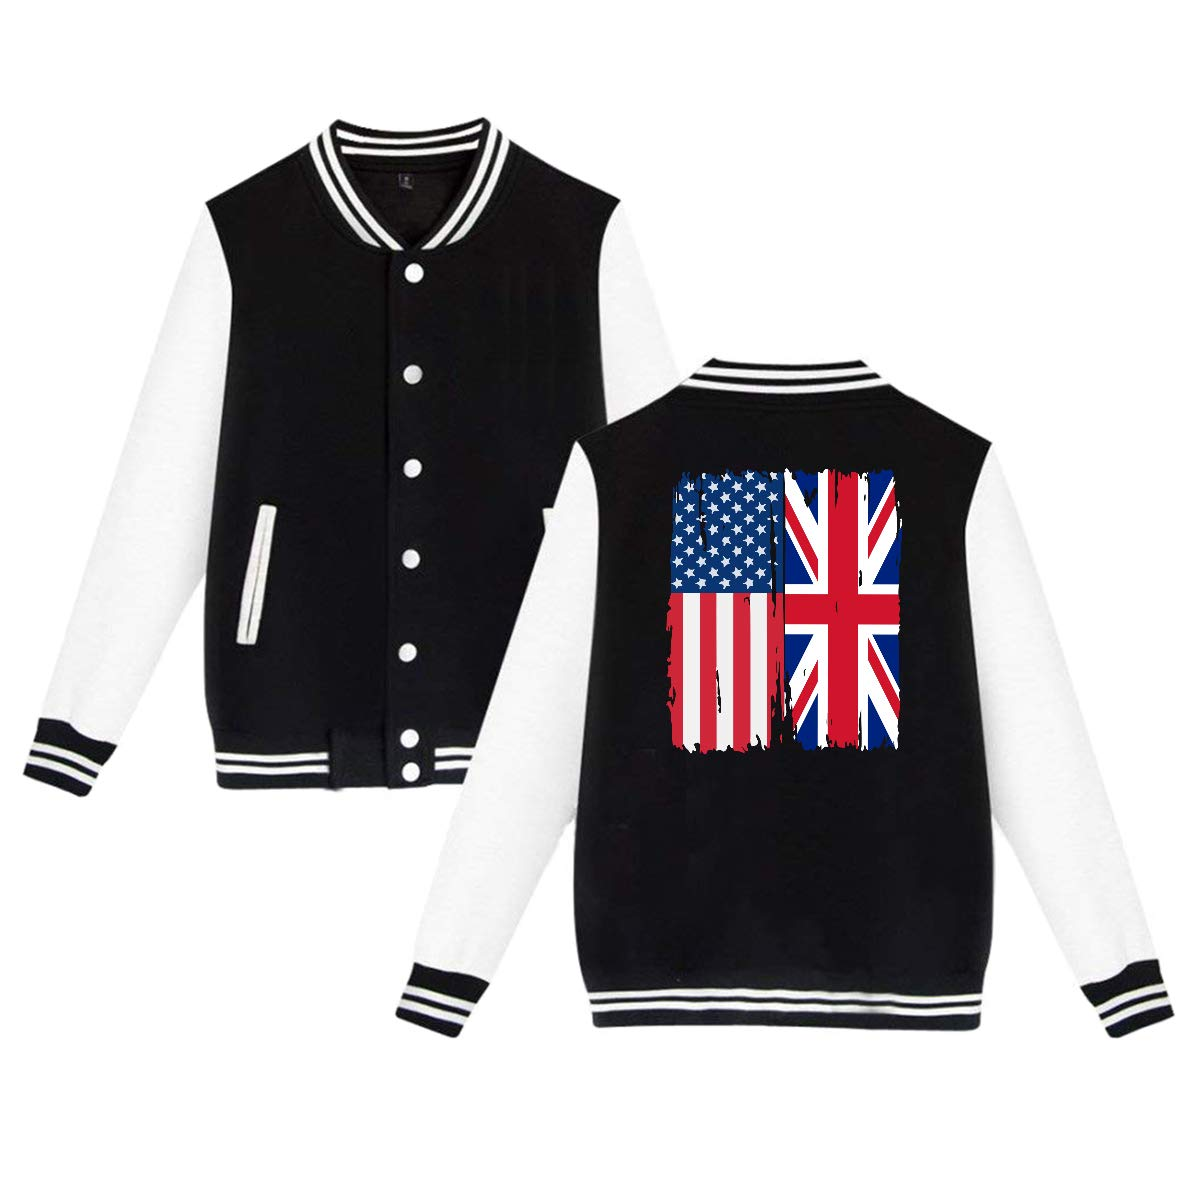 Unisex Baseball Jacket Uniform American British Flag Boys Girls Hoodie Sweatshirt Sweater Coat Back Print